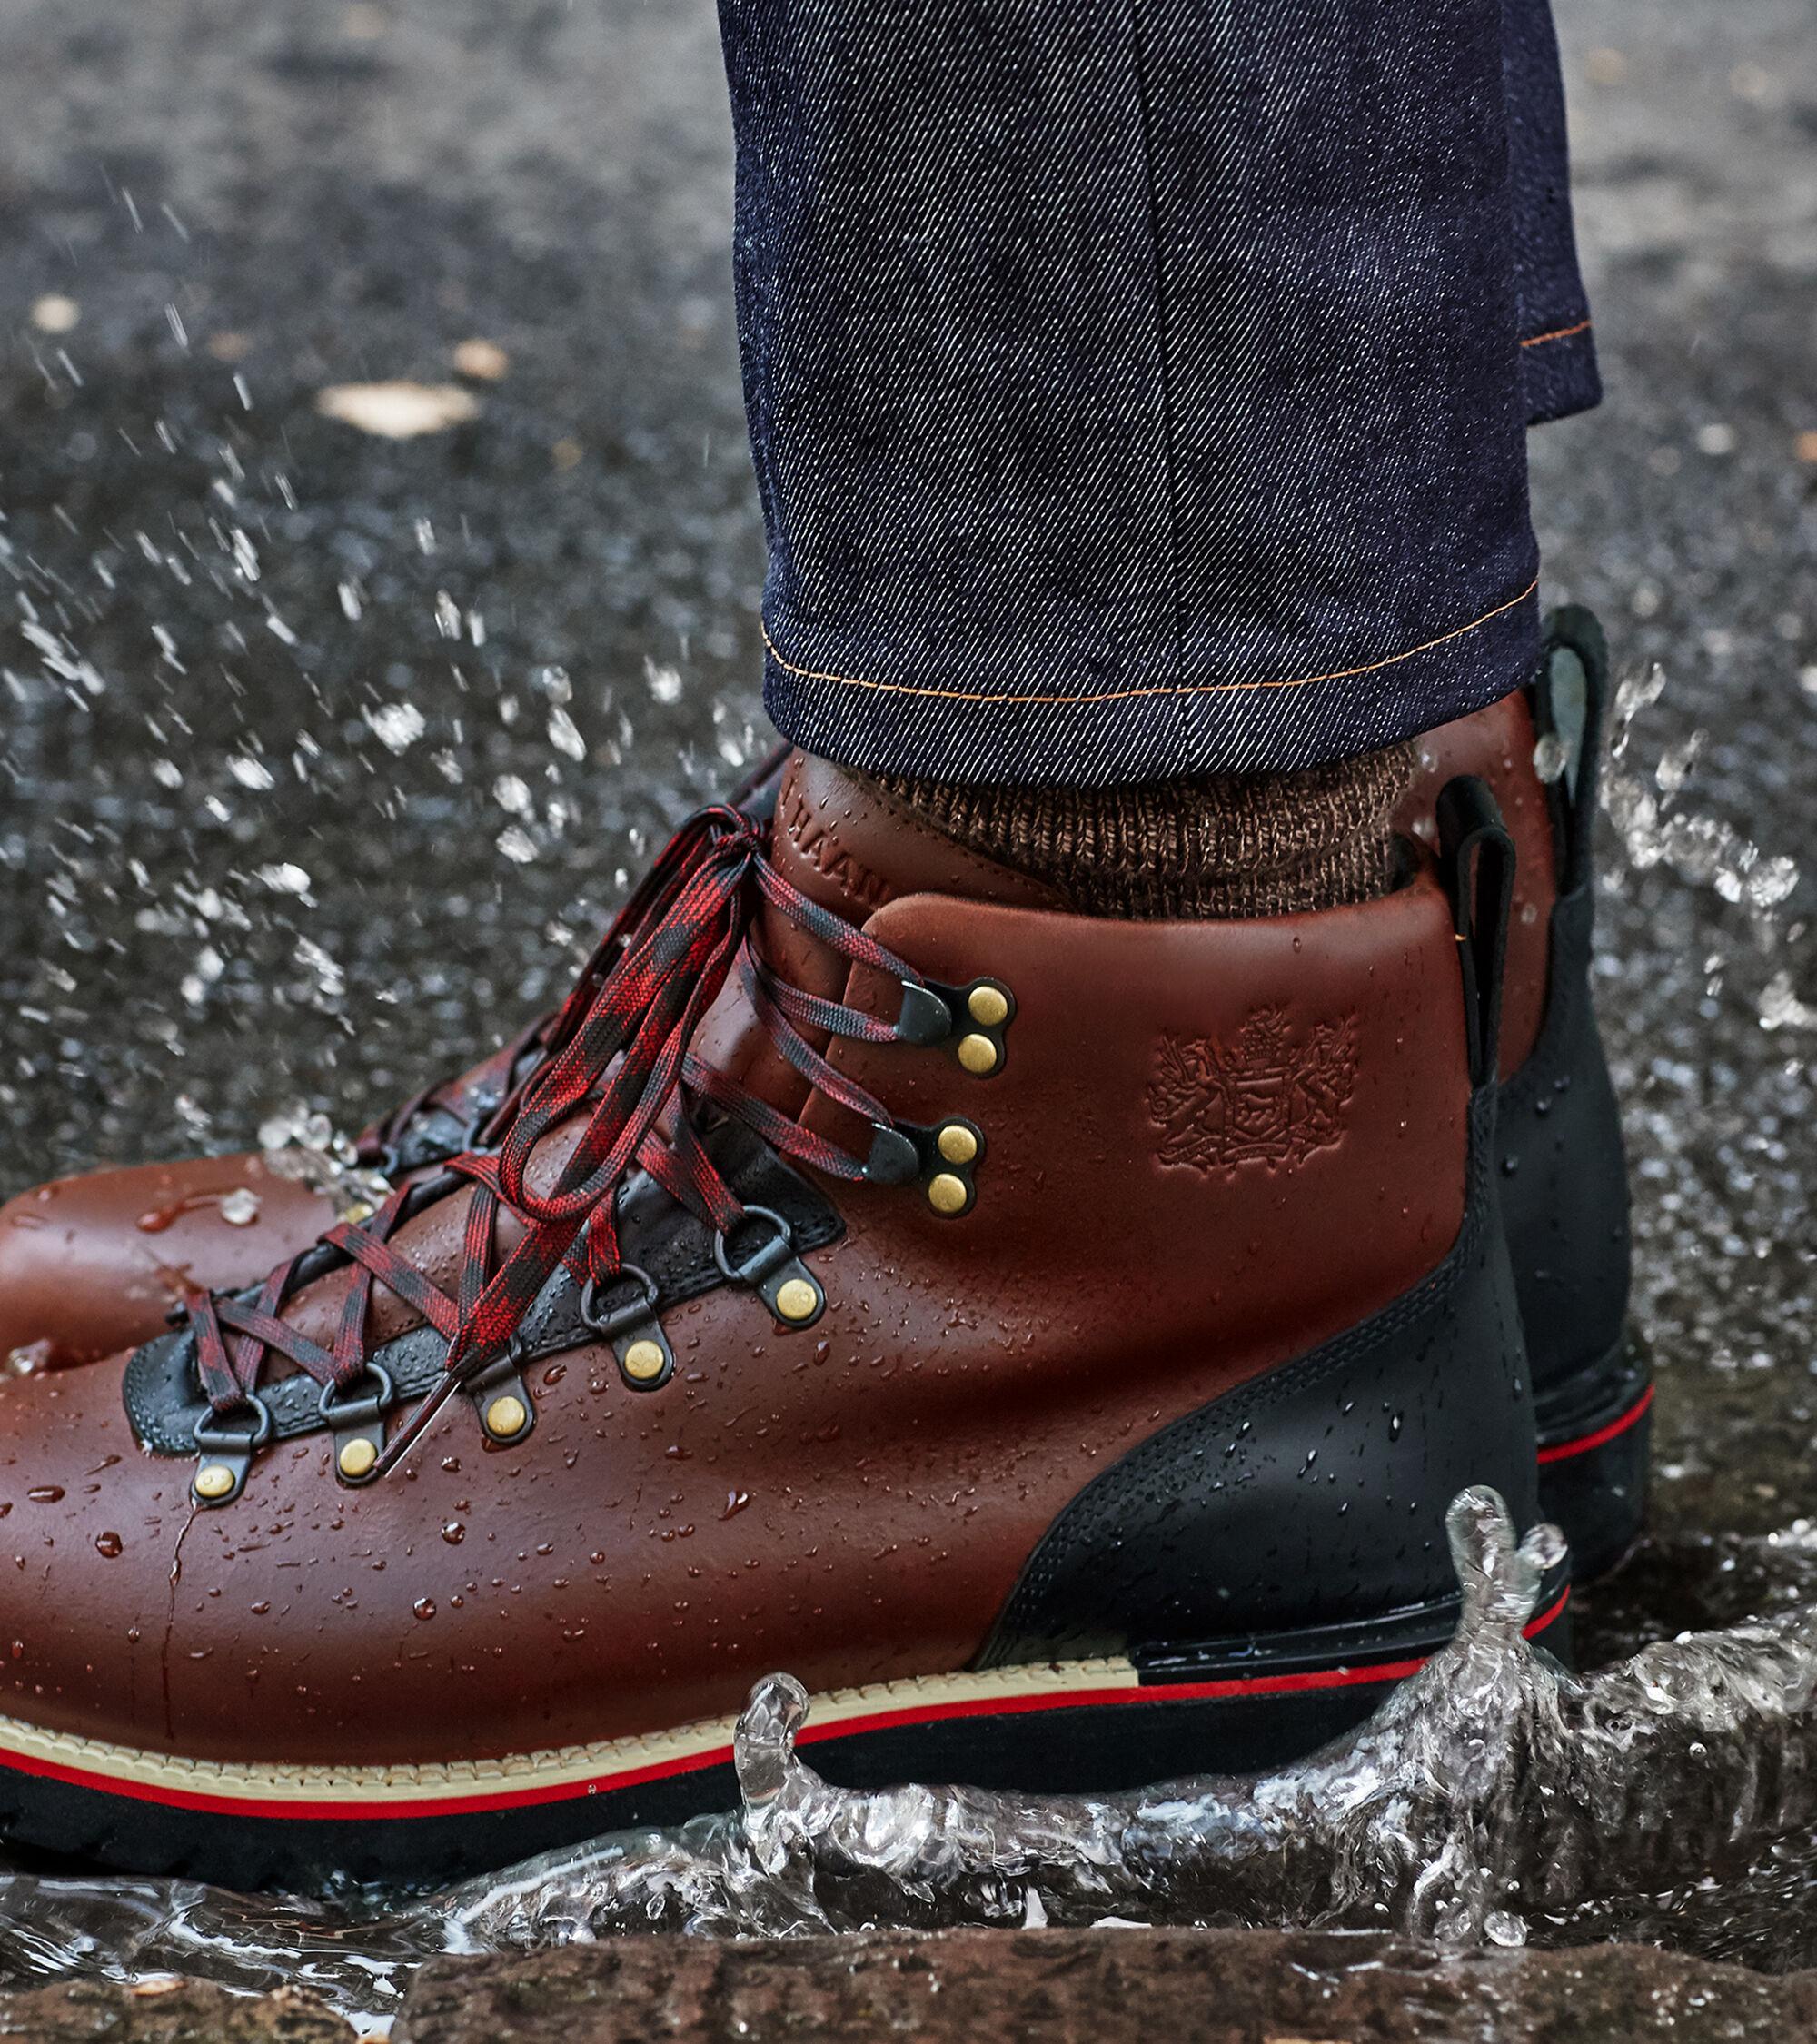 083e1de0f7f Men s ZEROGRAND Explore Waterproof Hiker Boots in Coffee